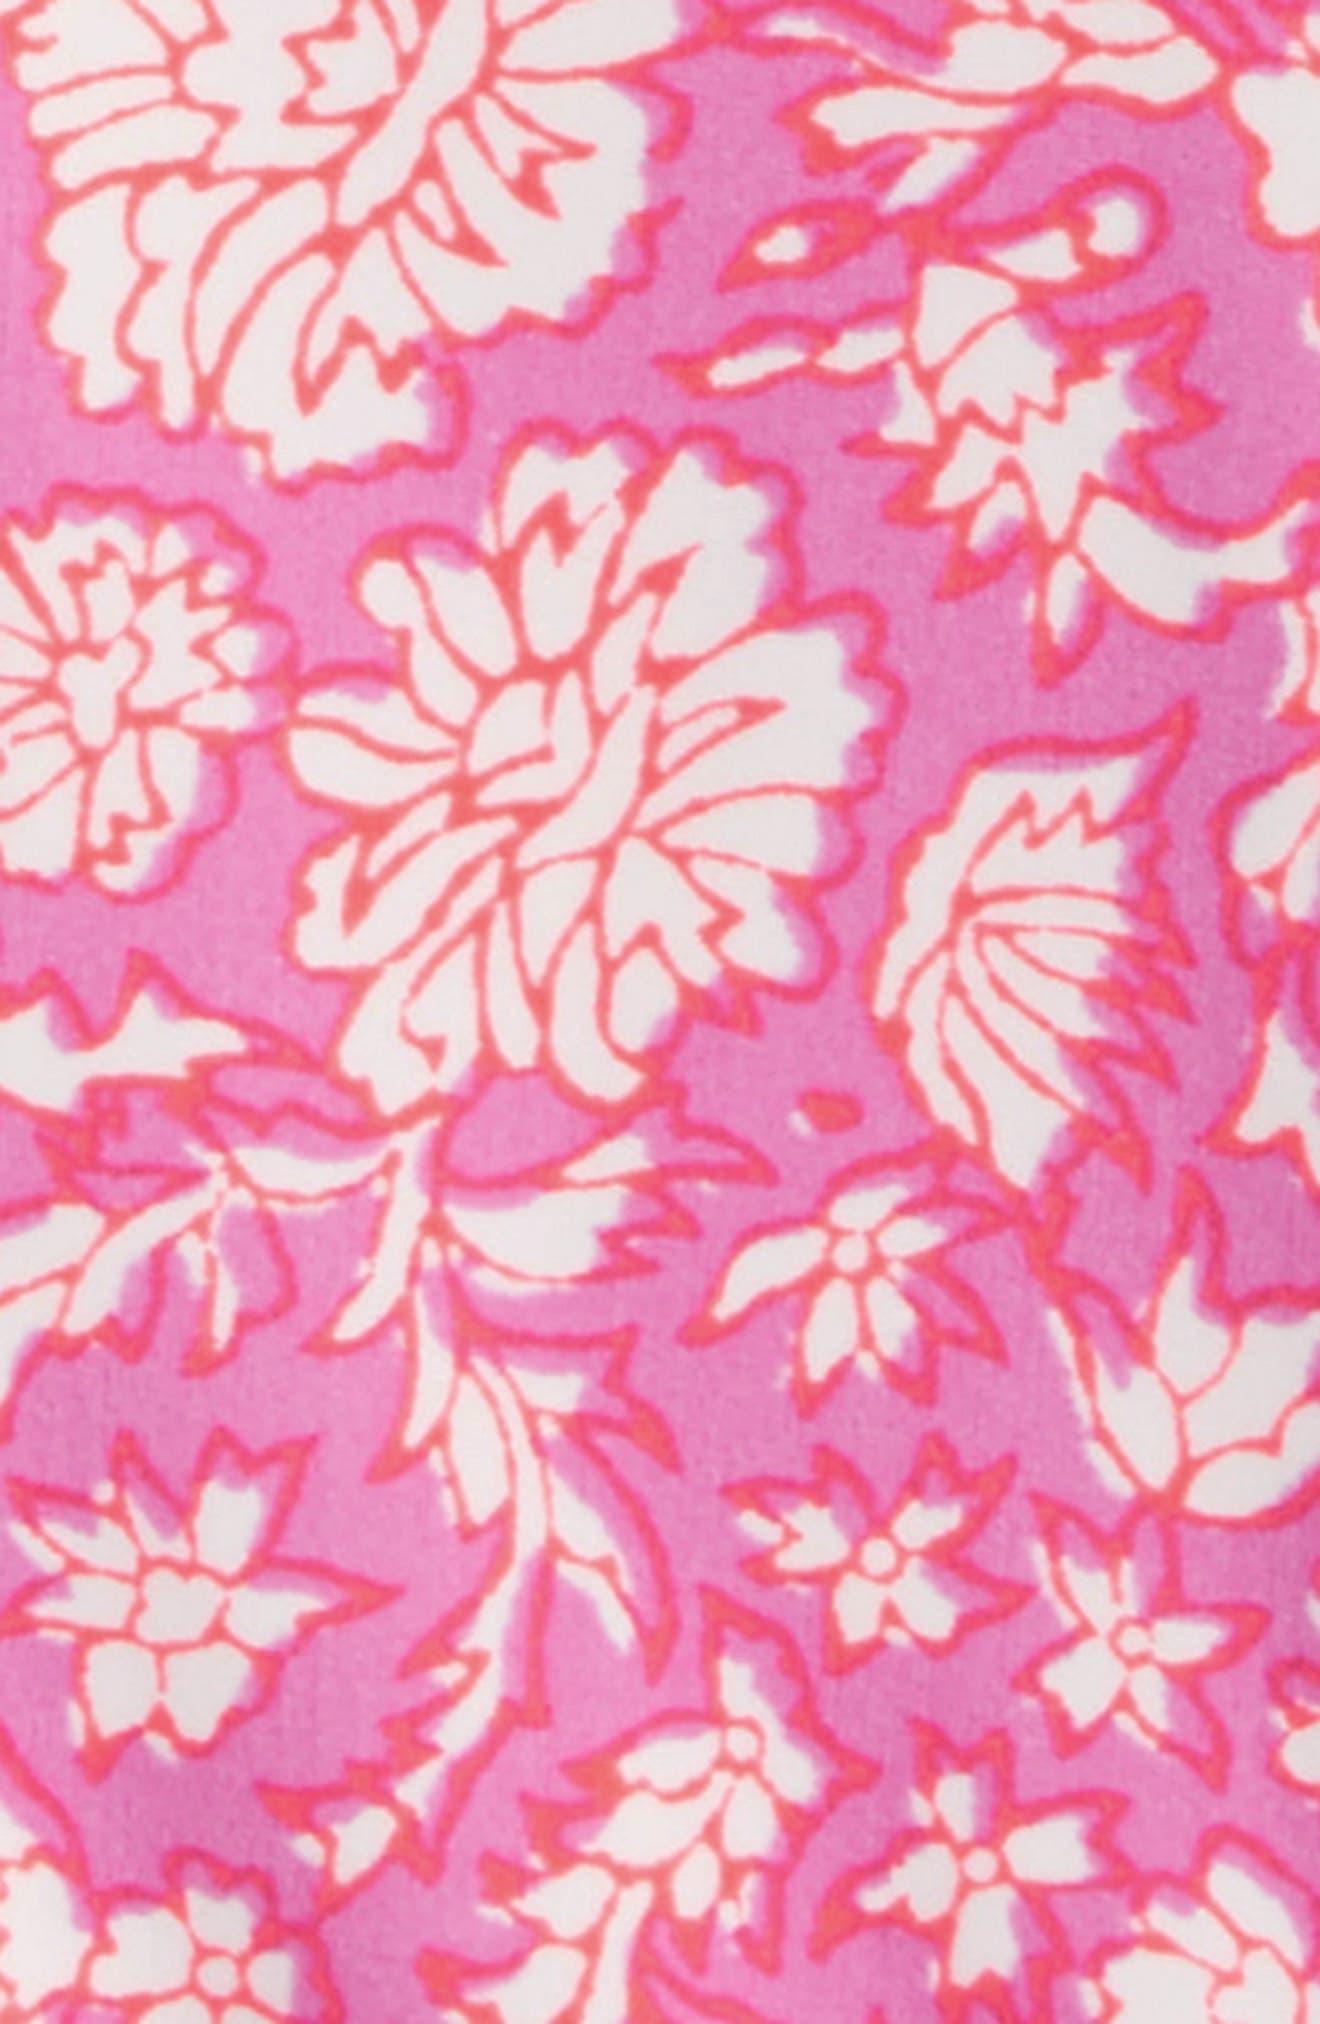 SZ Blockprints<sup>™</sup> Floral One-Piece Rashguard,                             Alternate thumbnail 2, color,                             Ivory Lavender Multi